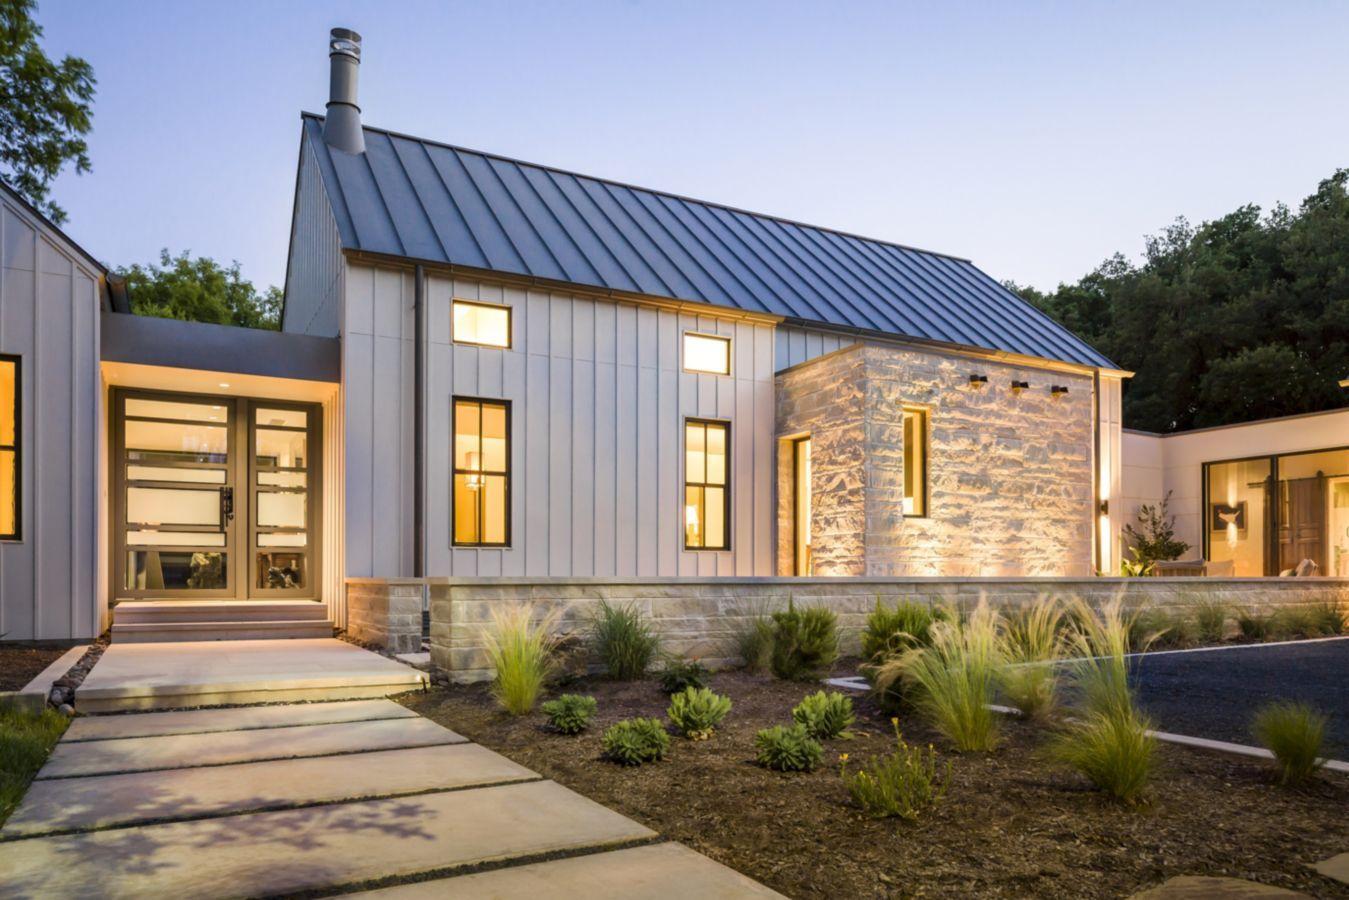 Olsen Home Exteriors: Exterior By Olsen Studios 5